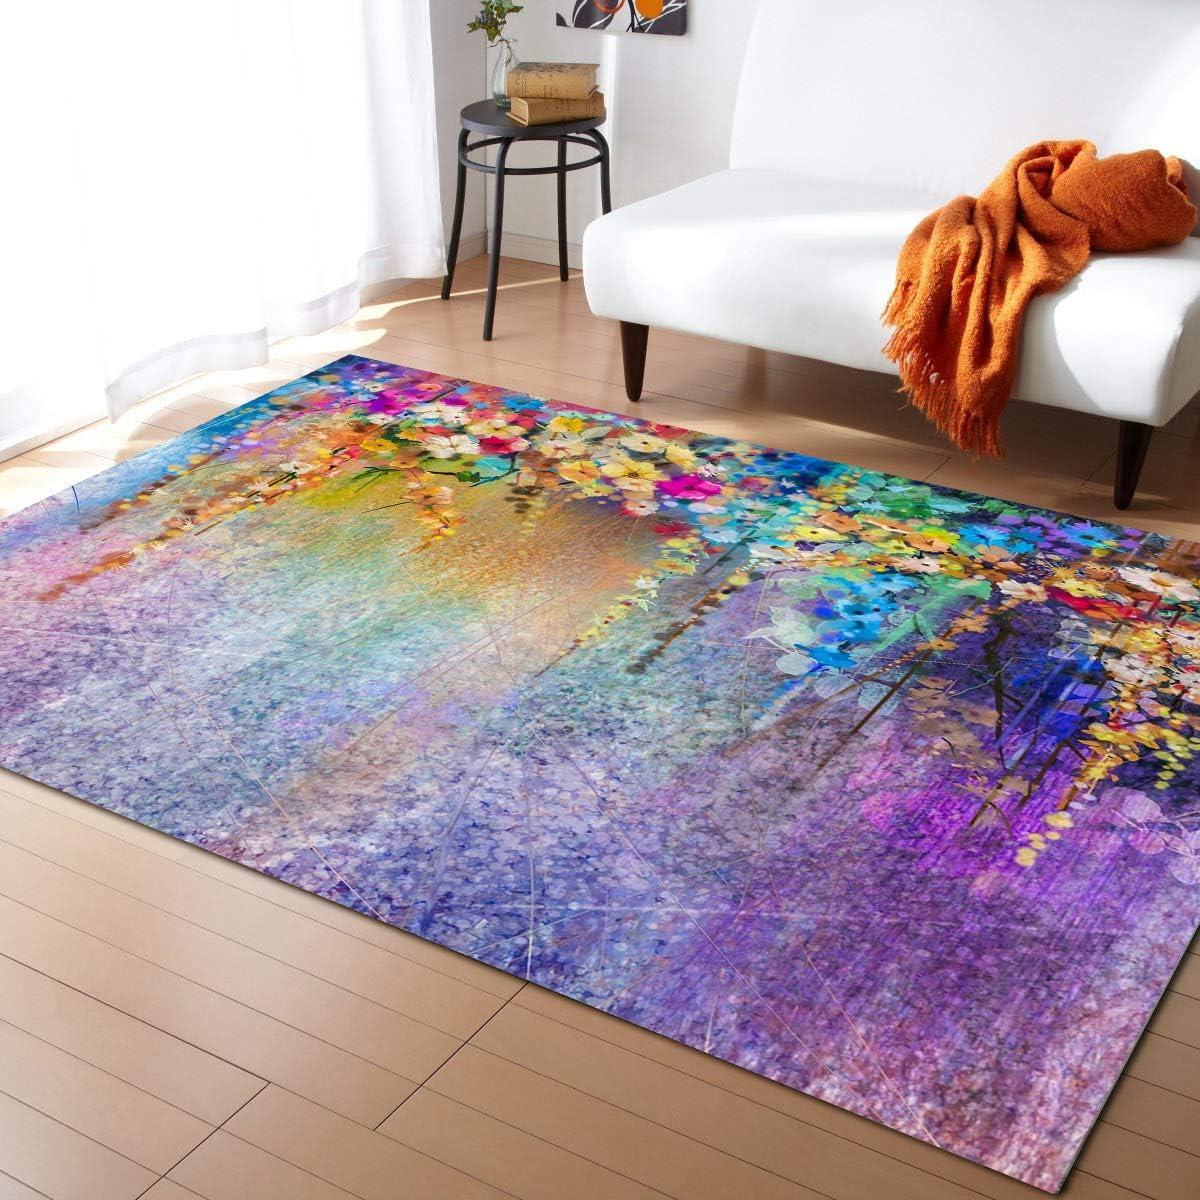 Aomike Indoor Area Rug Doormat- Watercolor Contemp Purple Flower Max 90% OFF Max 66% OFF